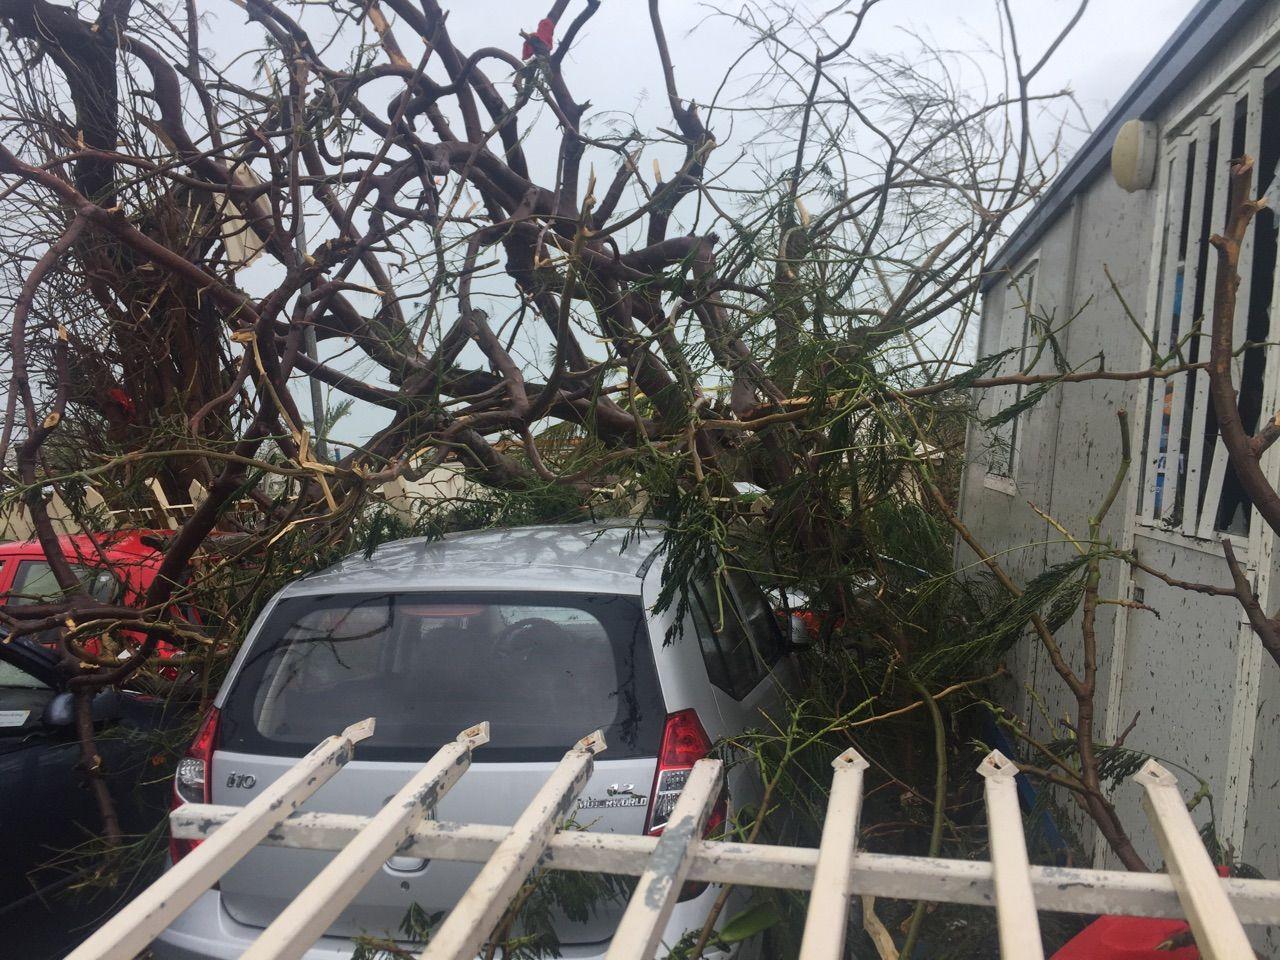 Damaged Caars By Irma